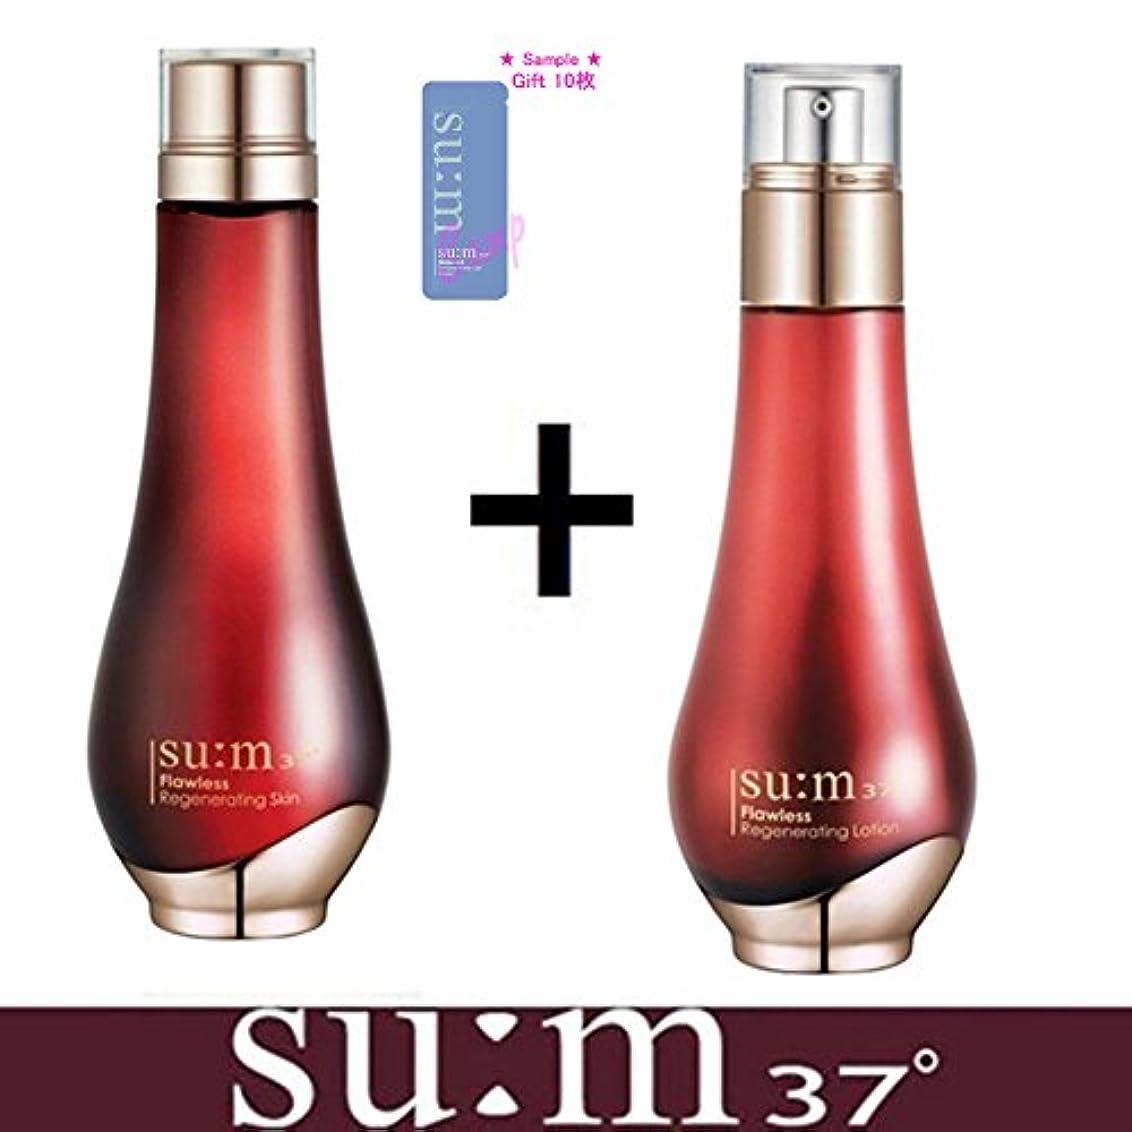 su:m37/スム37° 企画セット?激安 スム37 フロリススキン150ml + エモルジョン130ml (sum 37º Flawless Regenerating Skin 150ml + Lotion 130ml...